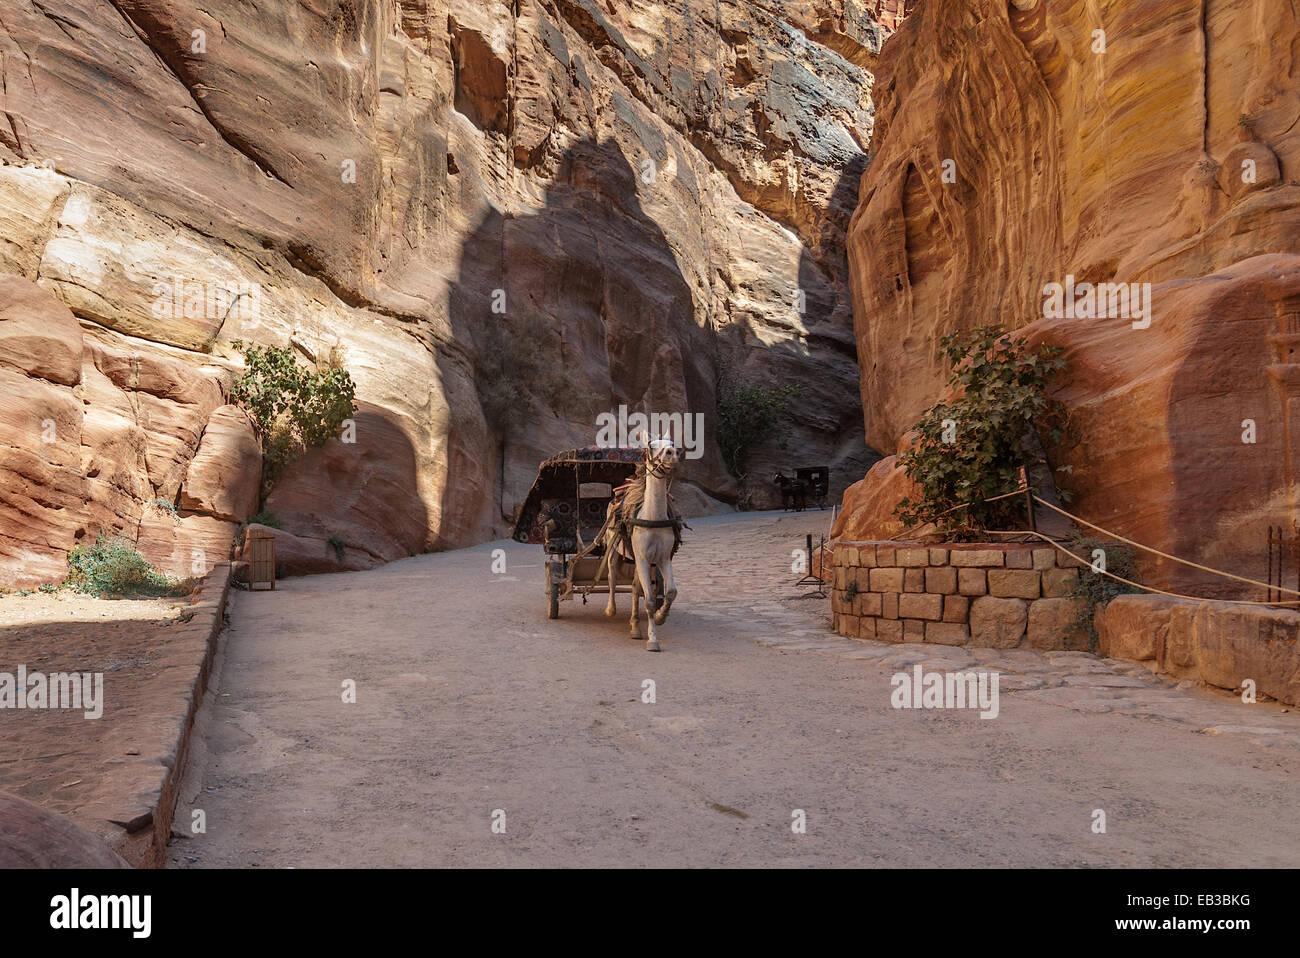 La Jordanie, Ma'an, euh Sayhun, Petra, Horse transport touristique ferries Photo Stock